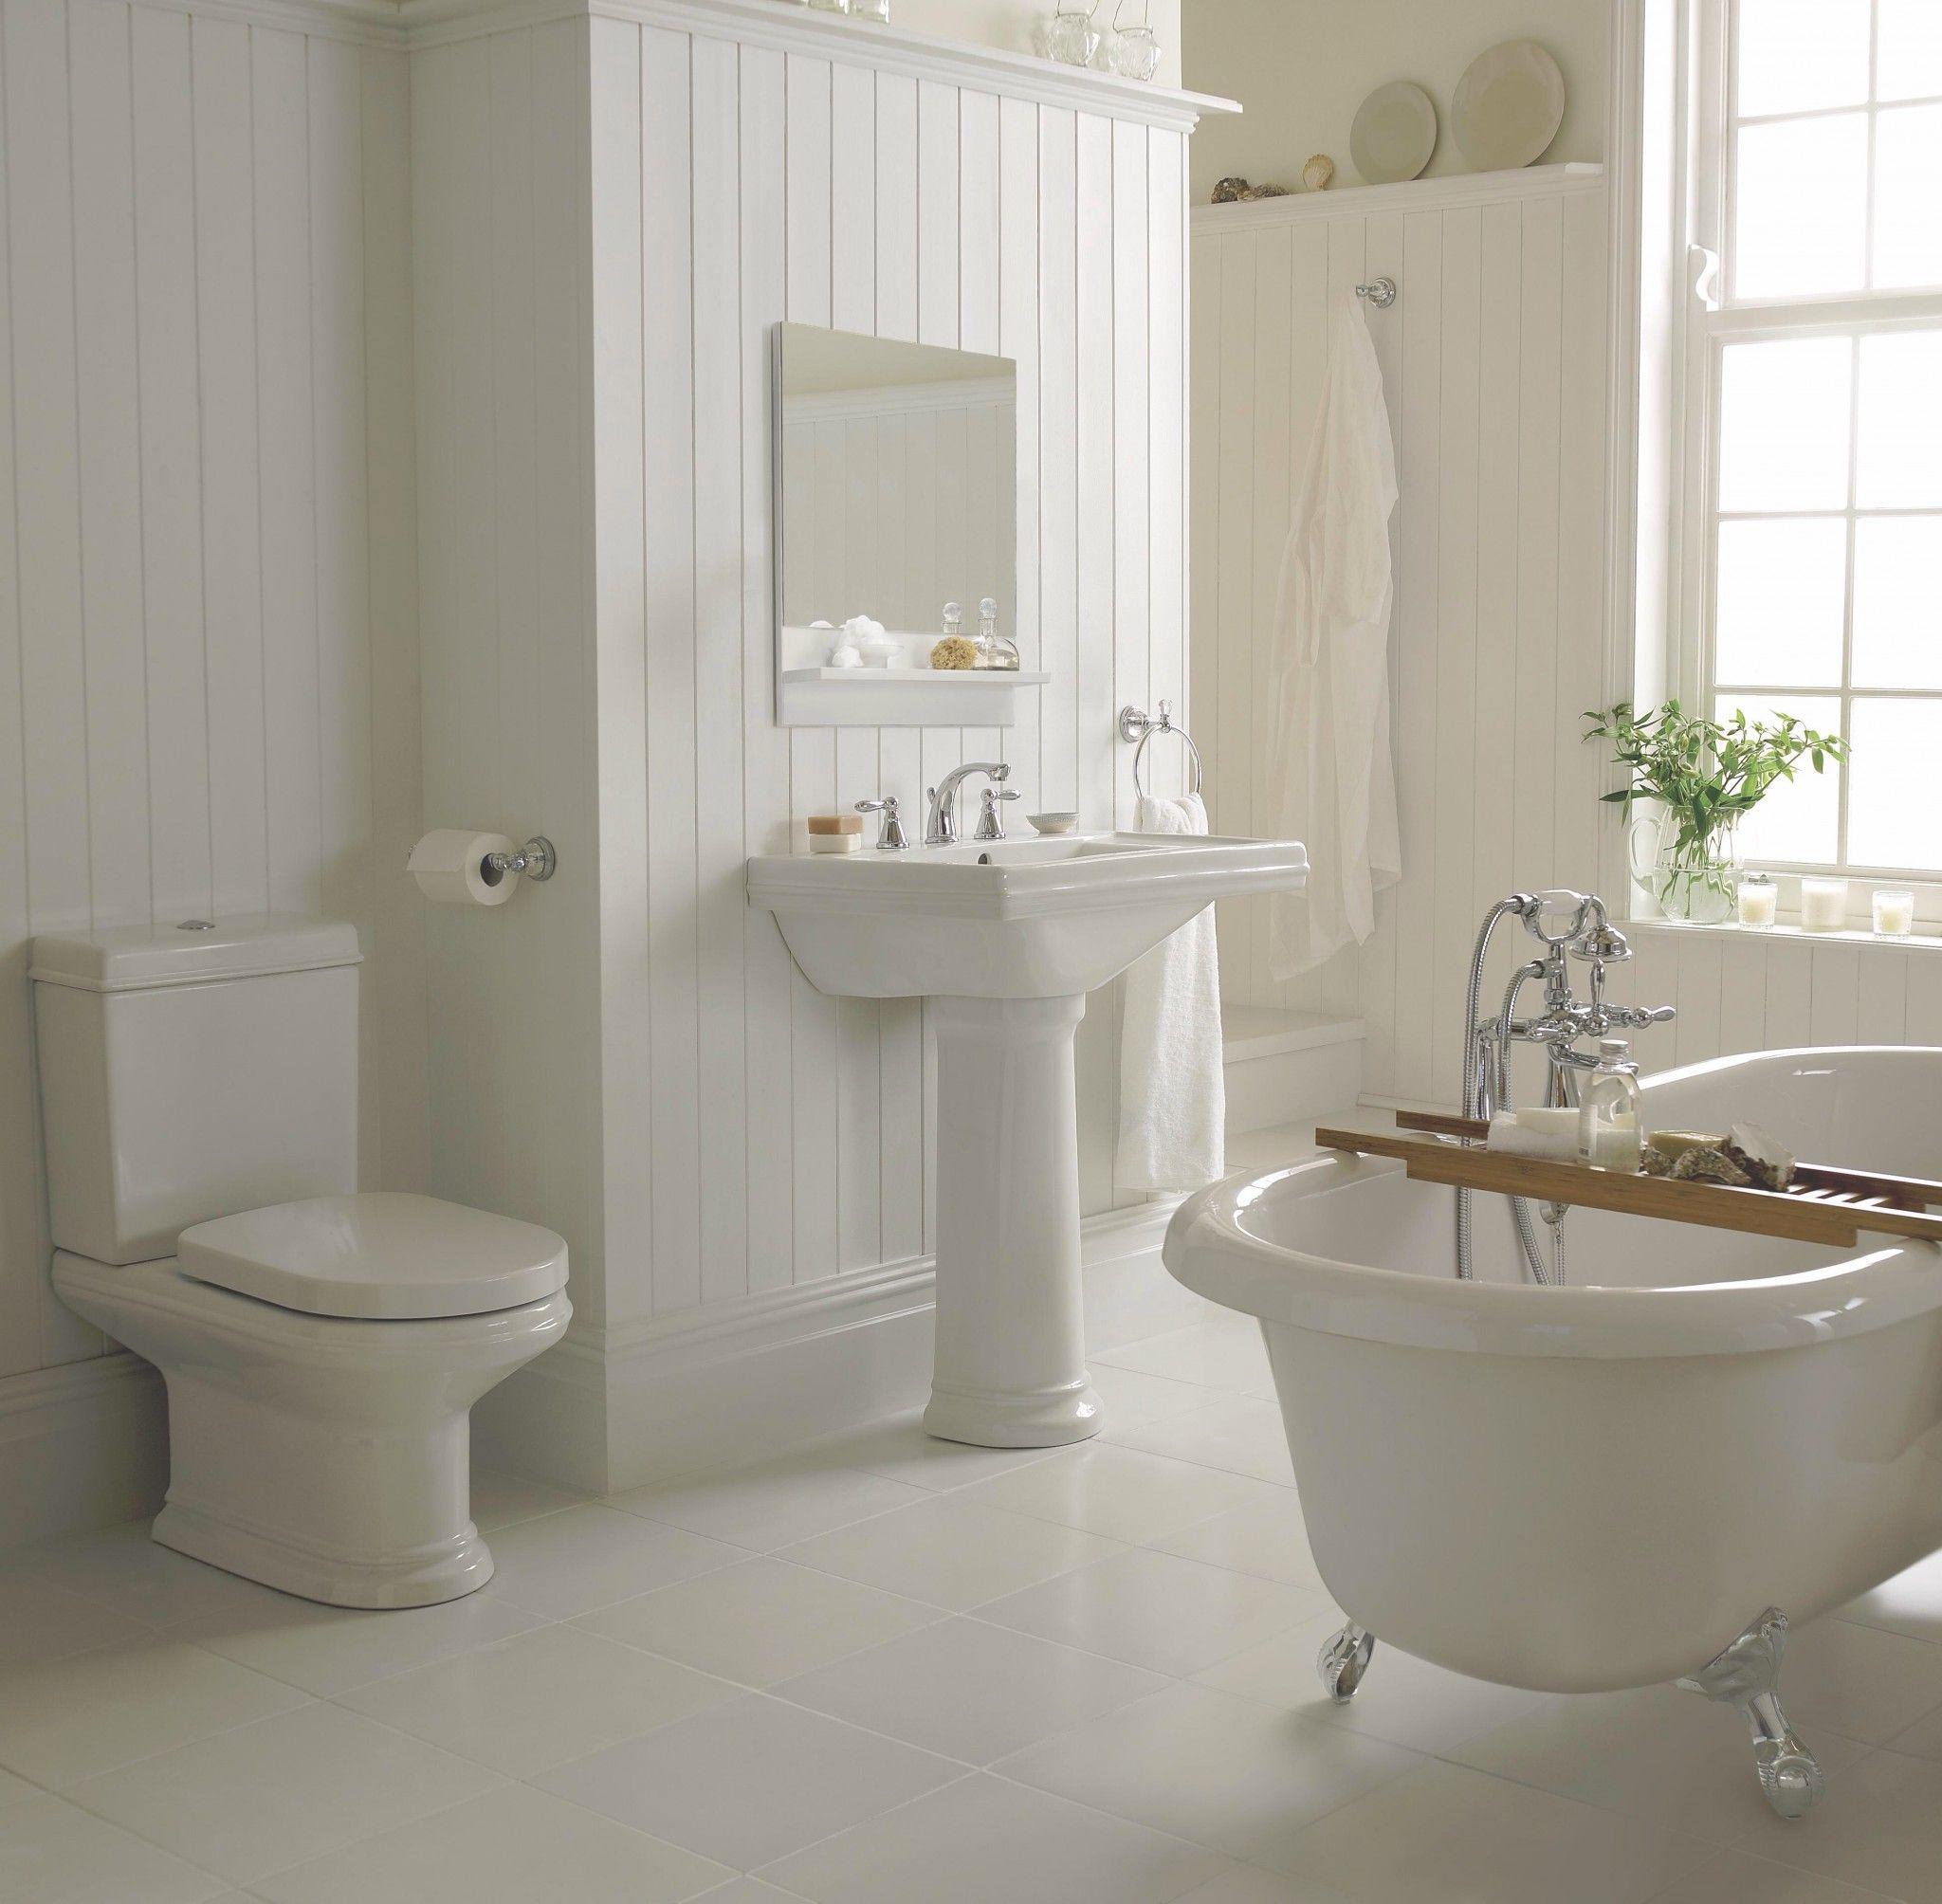 Garden tub decor  simplicity of wainscoating very appealing  Bathroom ideas  Pinterest